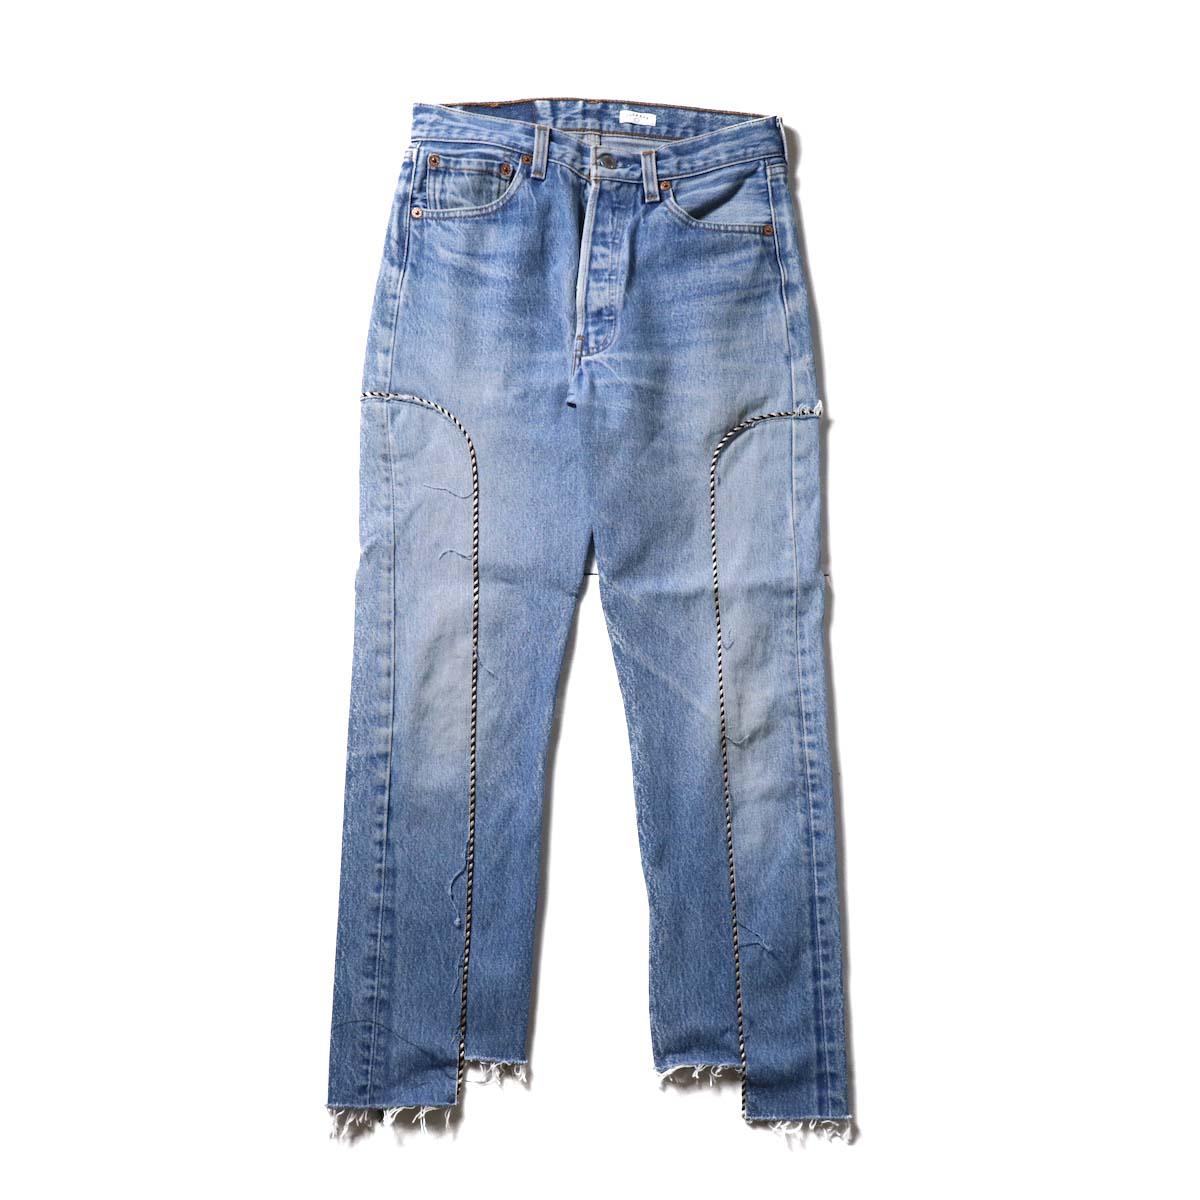 OLD PARK / Western Jeans Blue (Ssize-B)